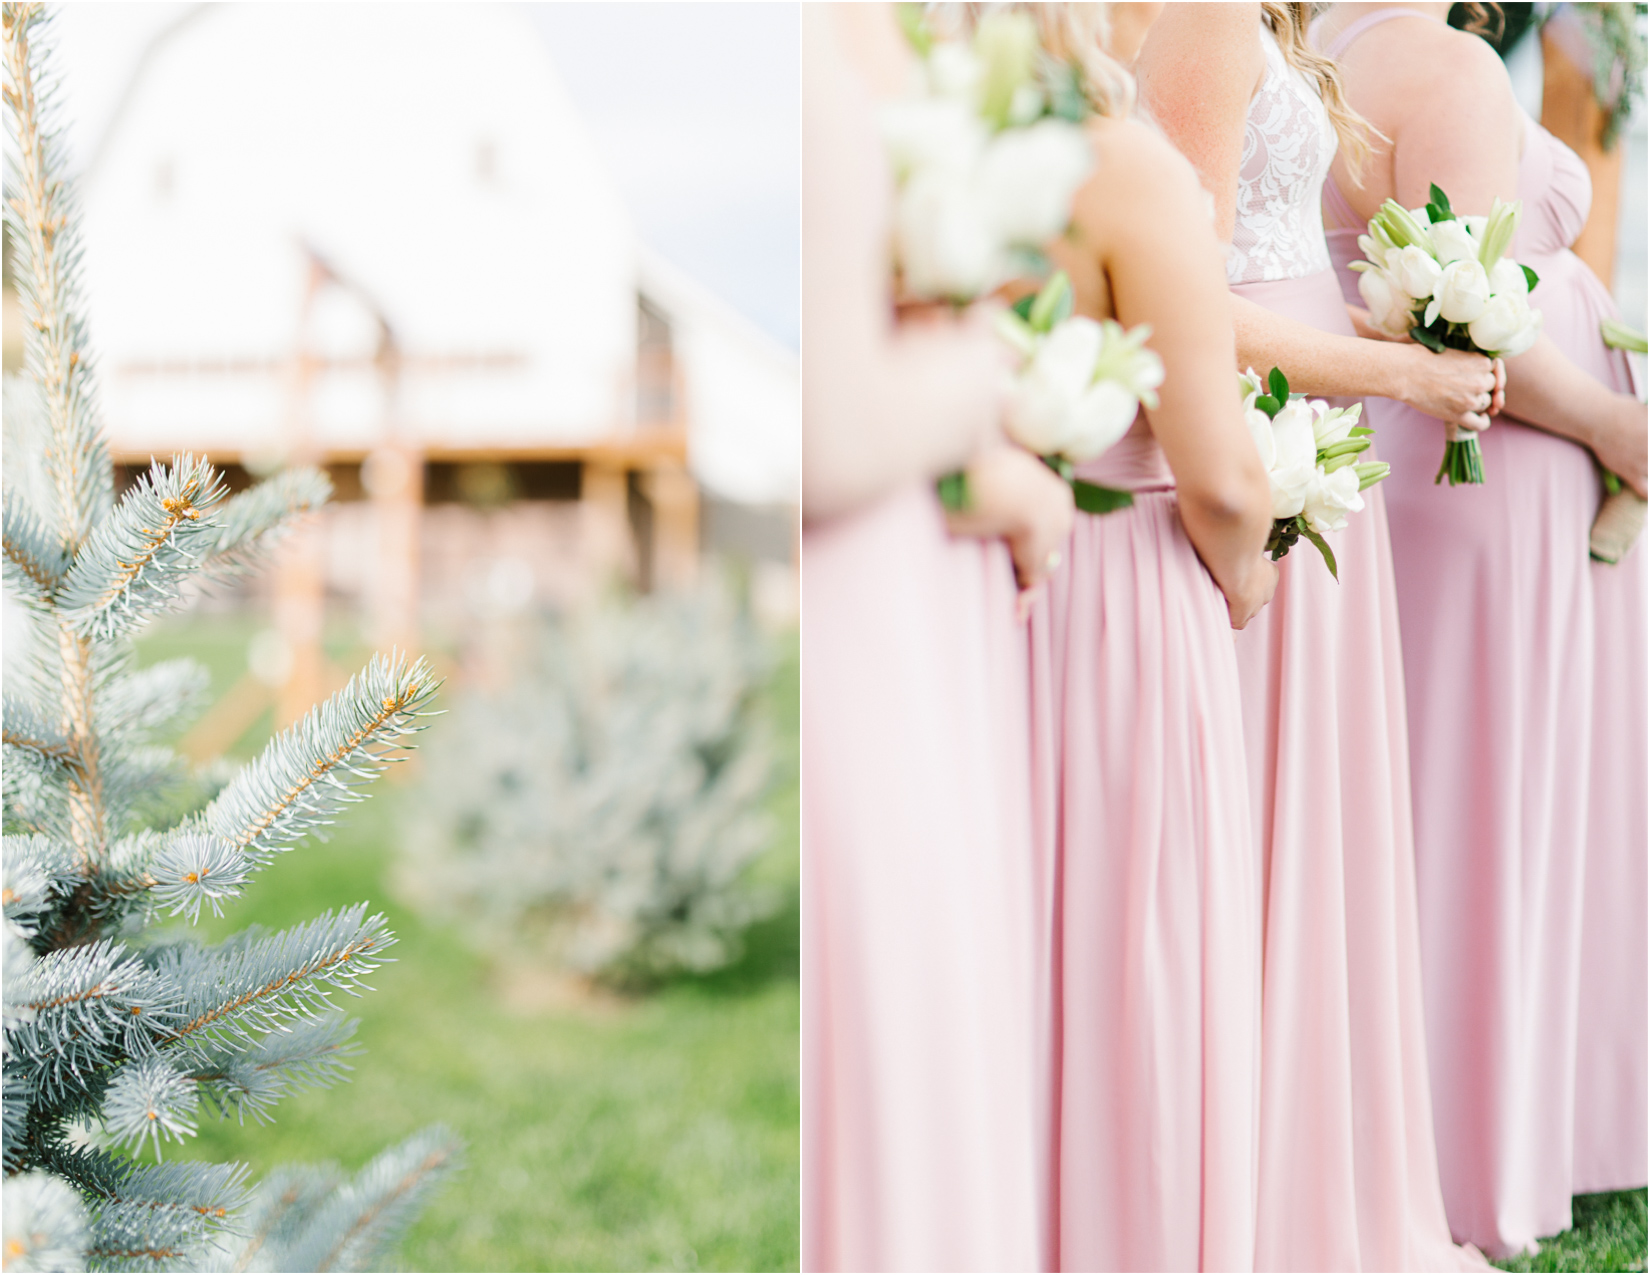 Hampton Hideaway Wedding Wenatchee, Washington | Wedding Details | Ceremony Details | PNW Wedding | VSCO | Blush Wedding.jpg